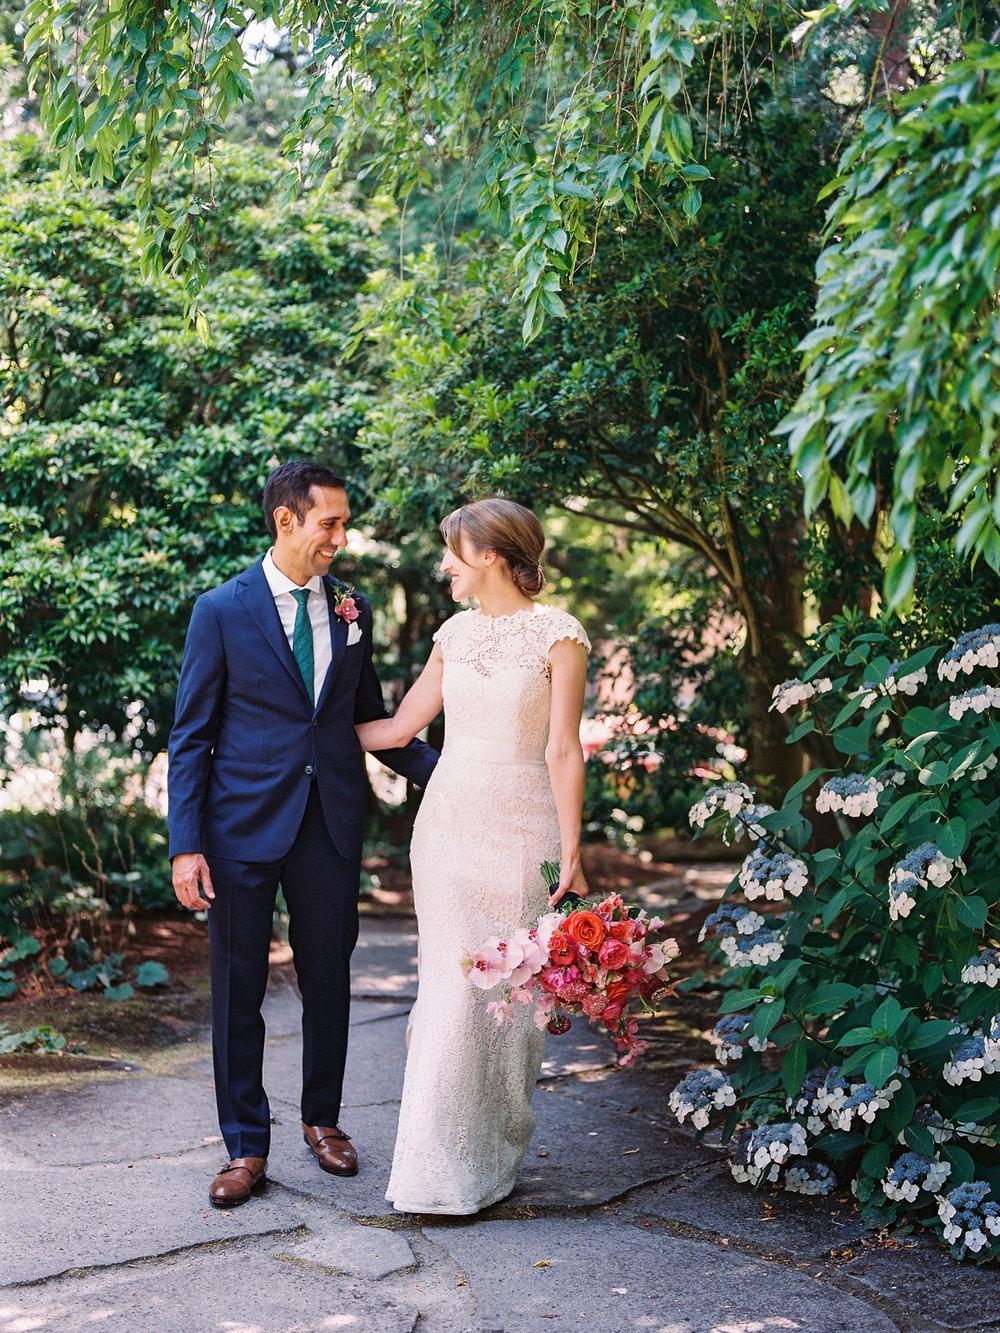 Seattle Parsons Garden Queen Anne Bride and Groom Portraits.jpg